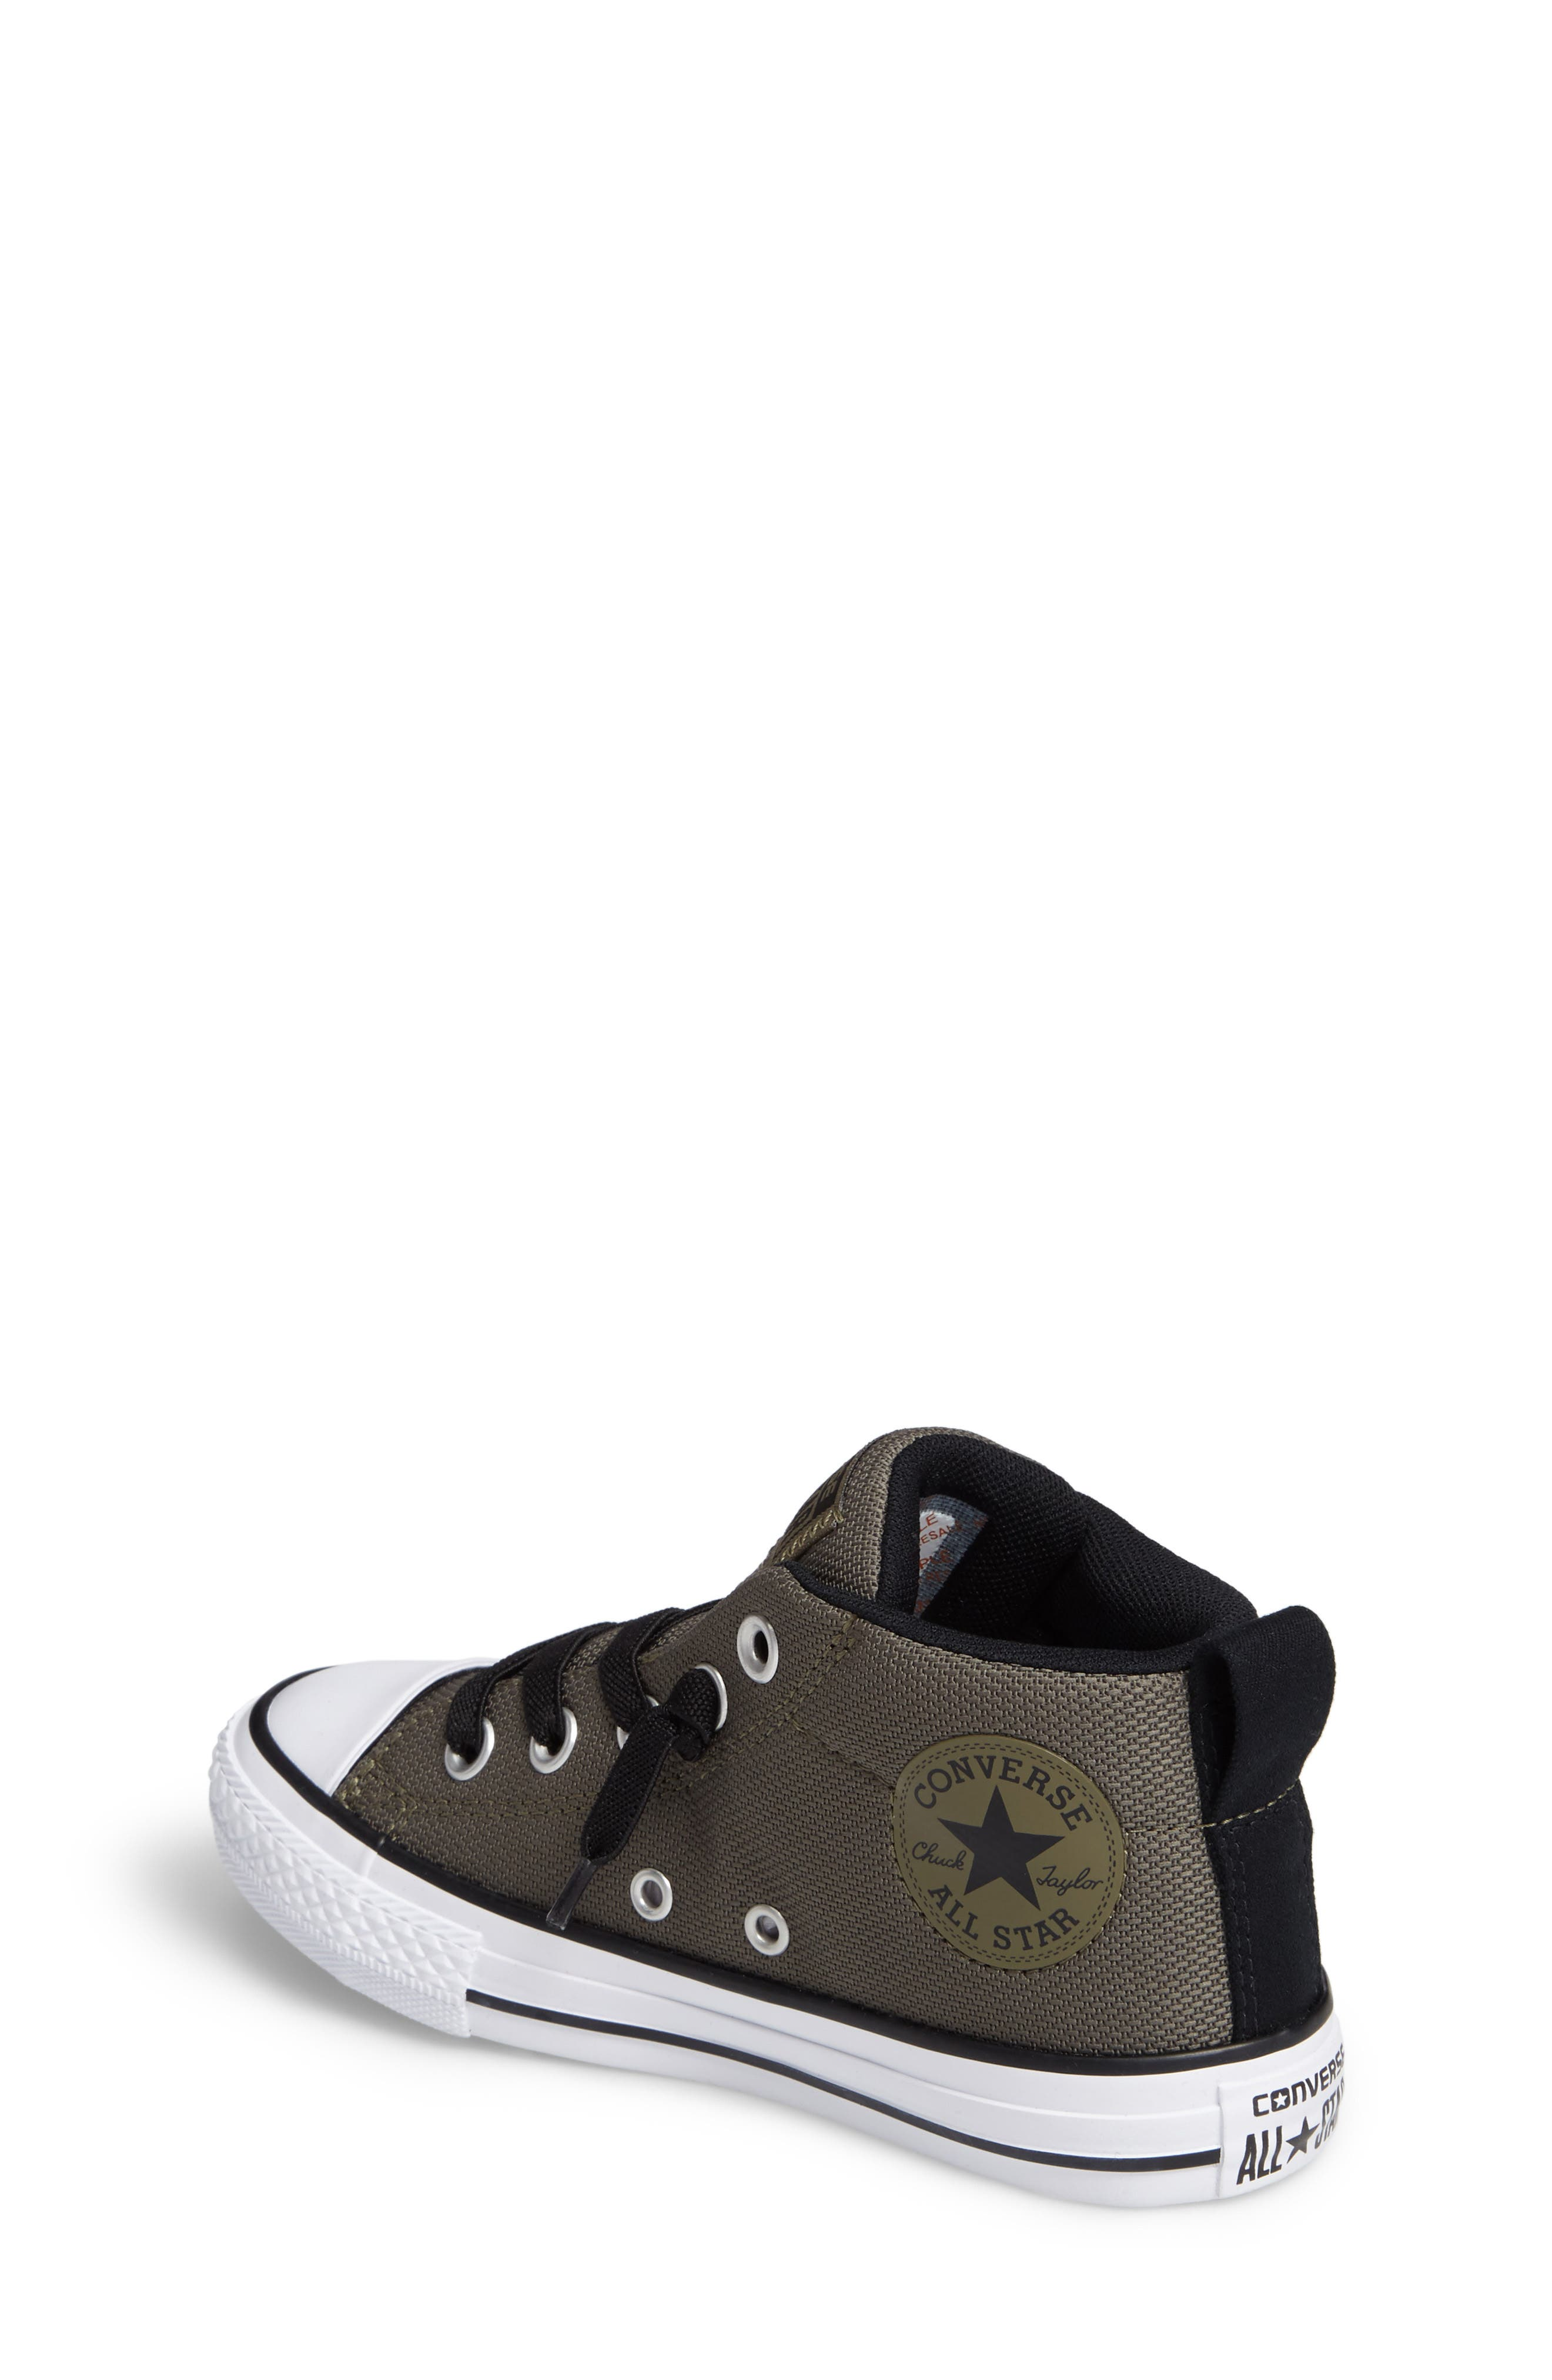 Alternate Image 2  - Converse Chuck Taylor® All Star® Basket Weave Street Mid Sneaker (Toddler, Little Kid & Big Kid)